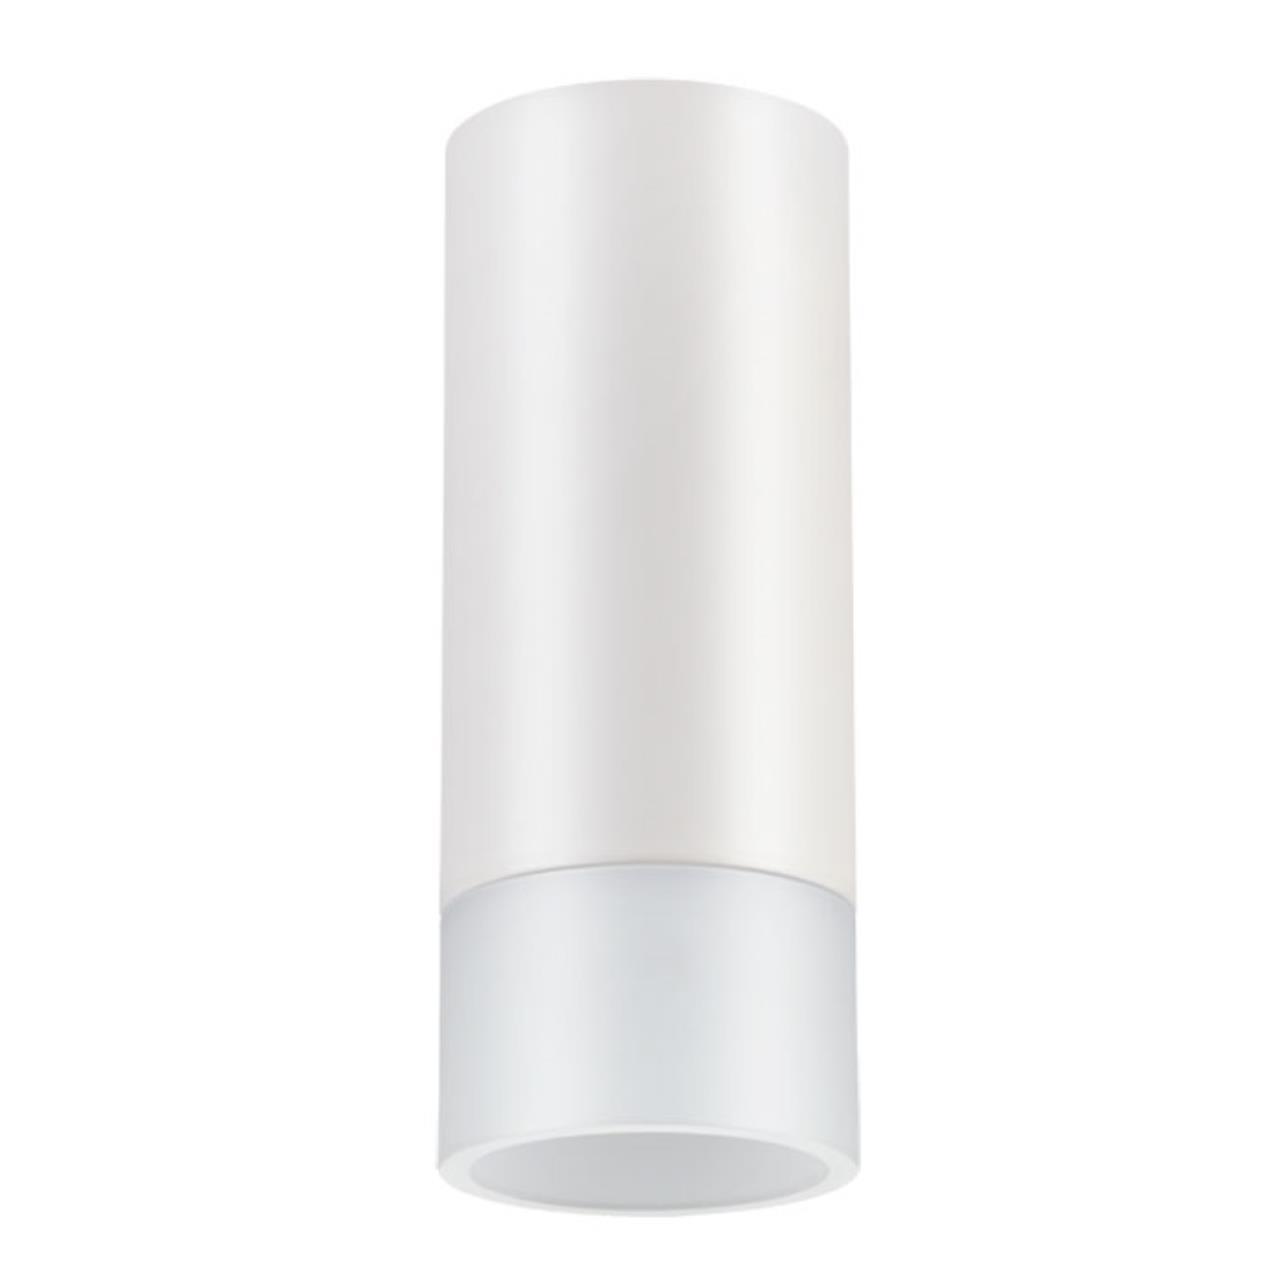 357459 OVER NT18 073 матовый белый Накладной светильник IP20 LED 3000K 10W 100-240V SOLO